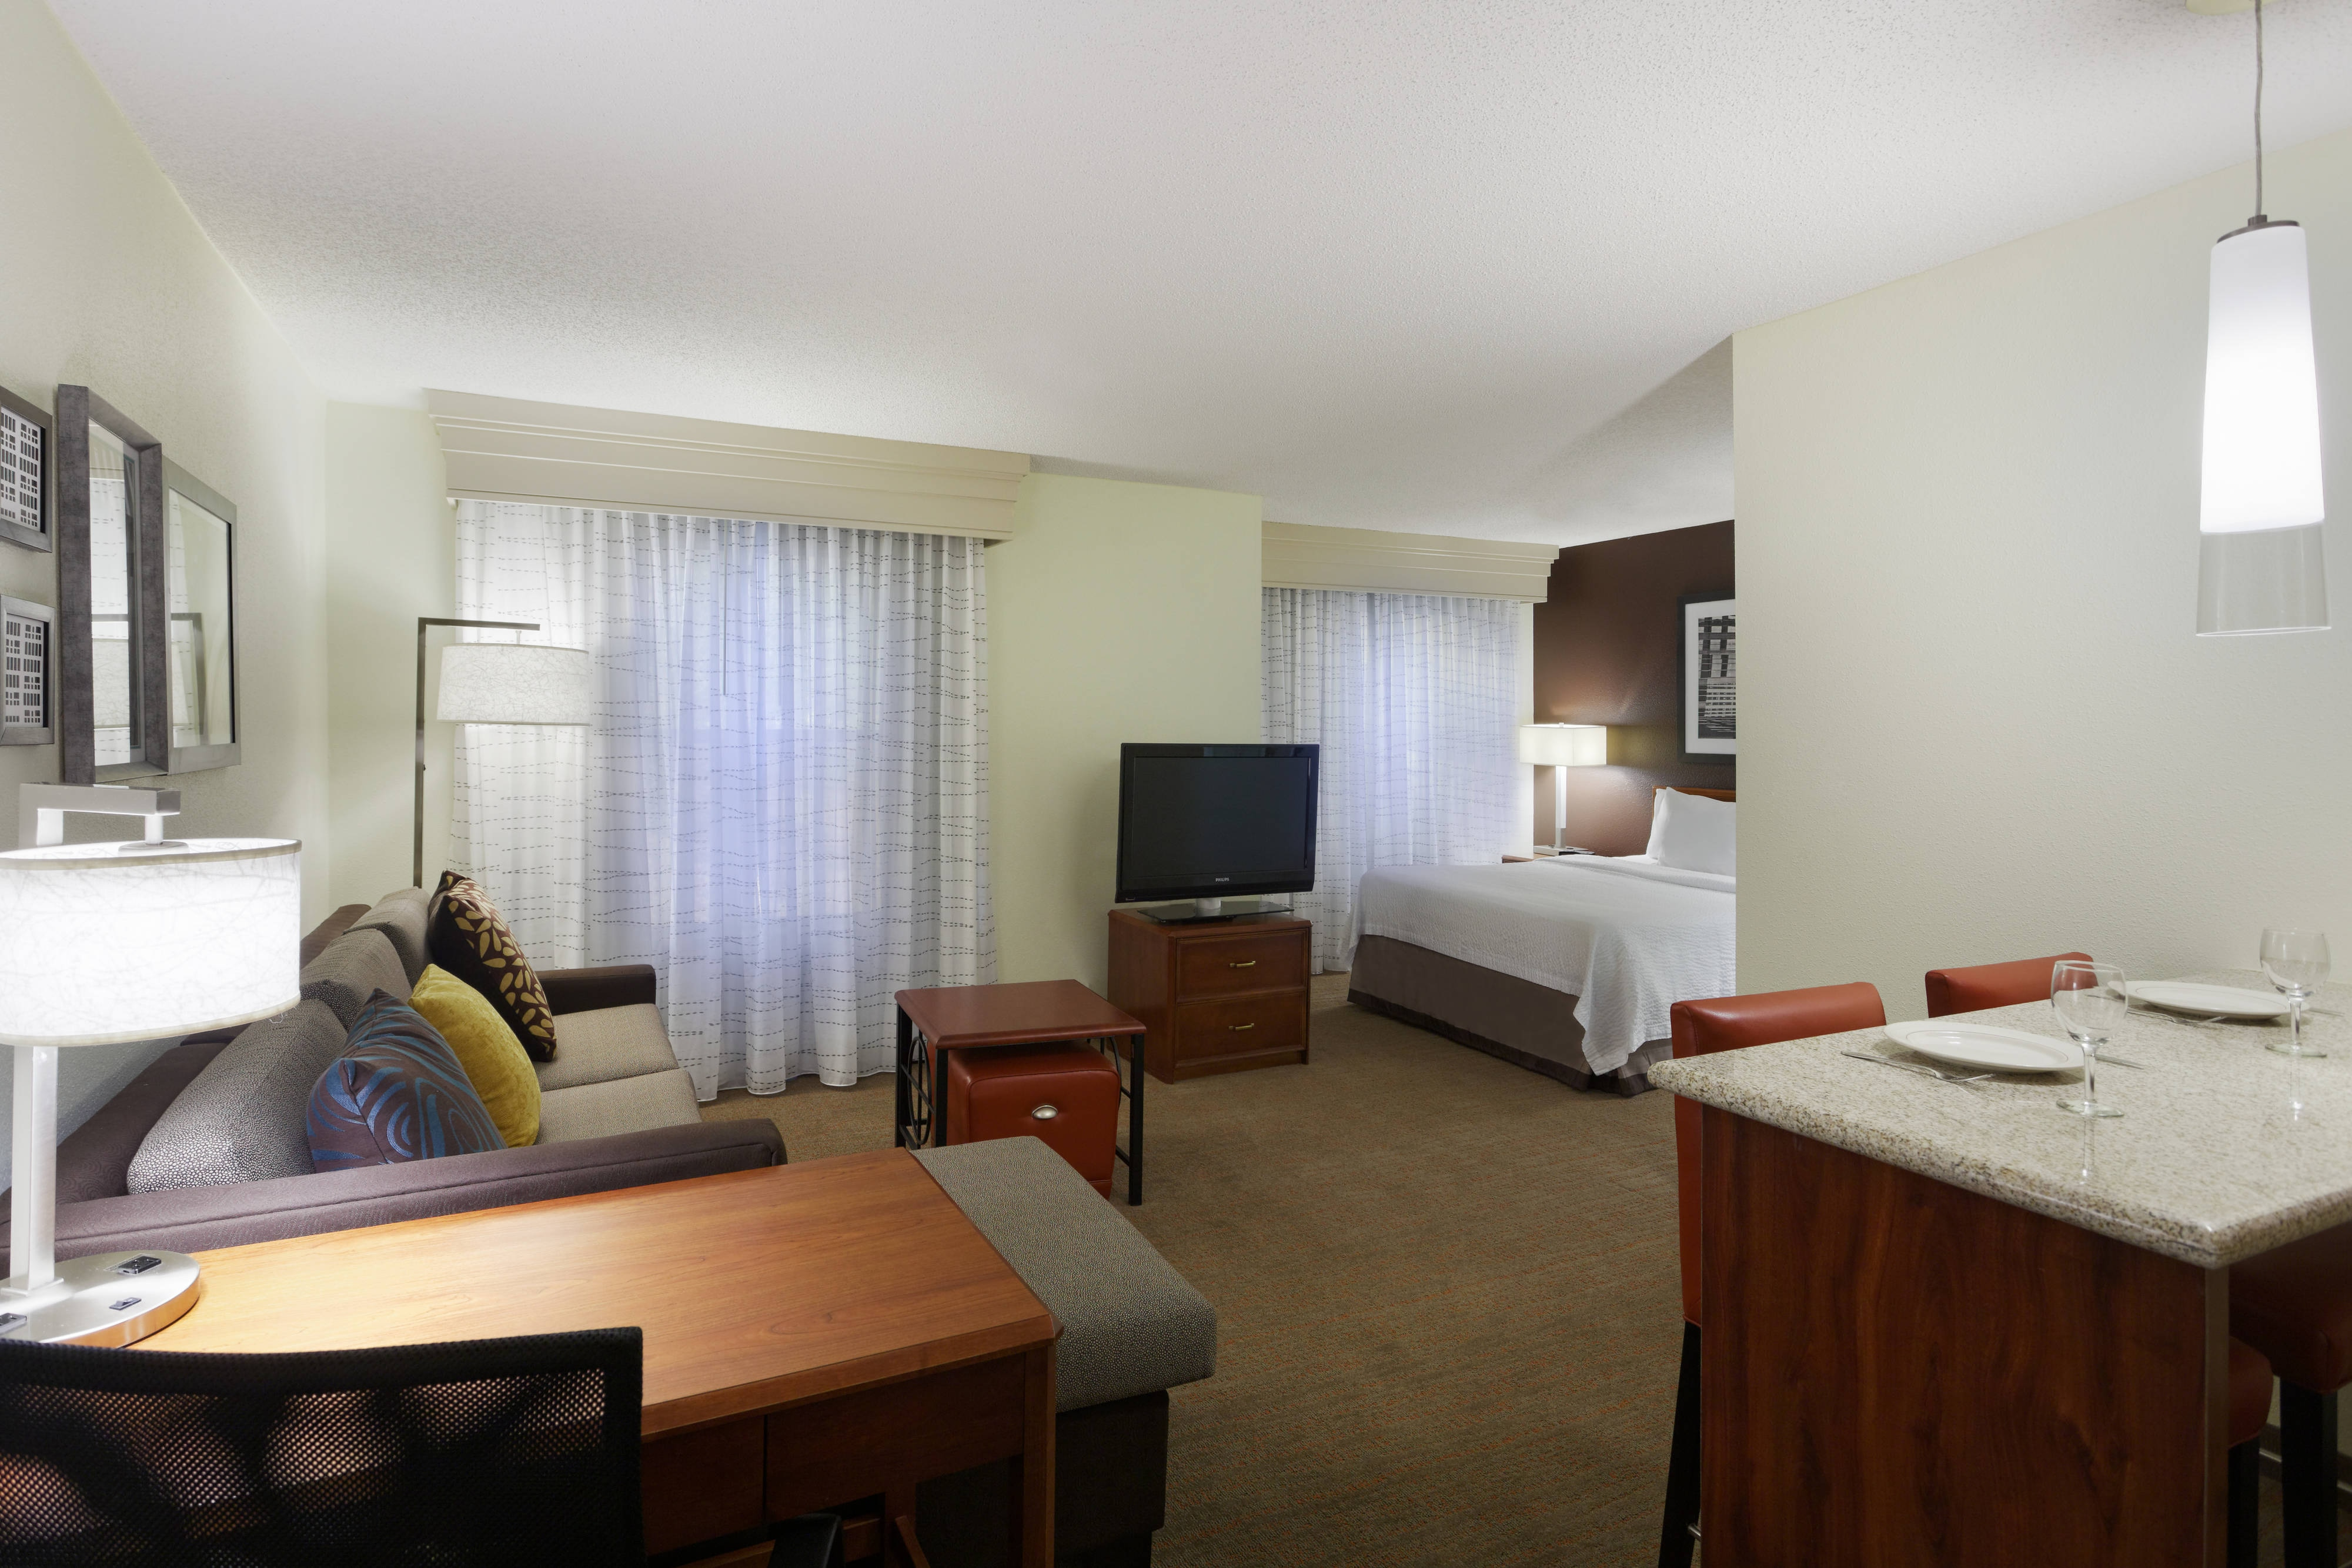 hotel room near greenville airport